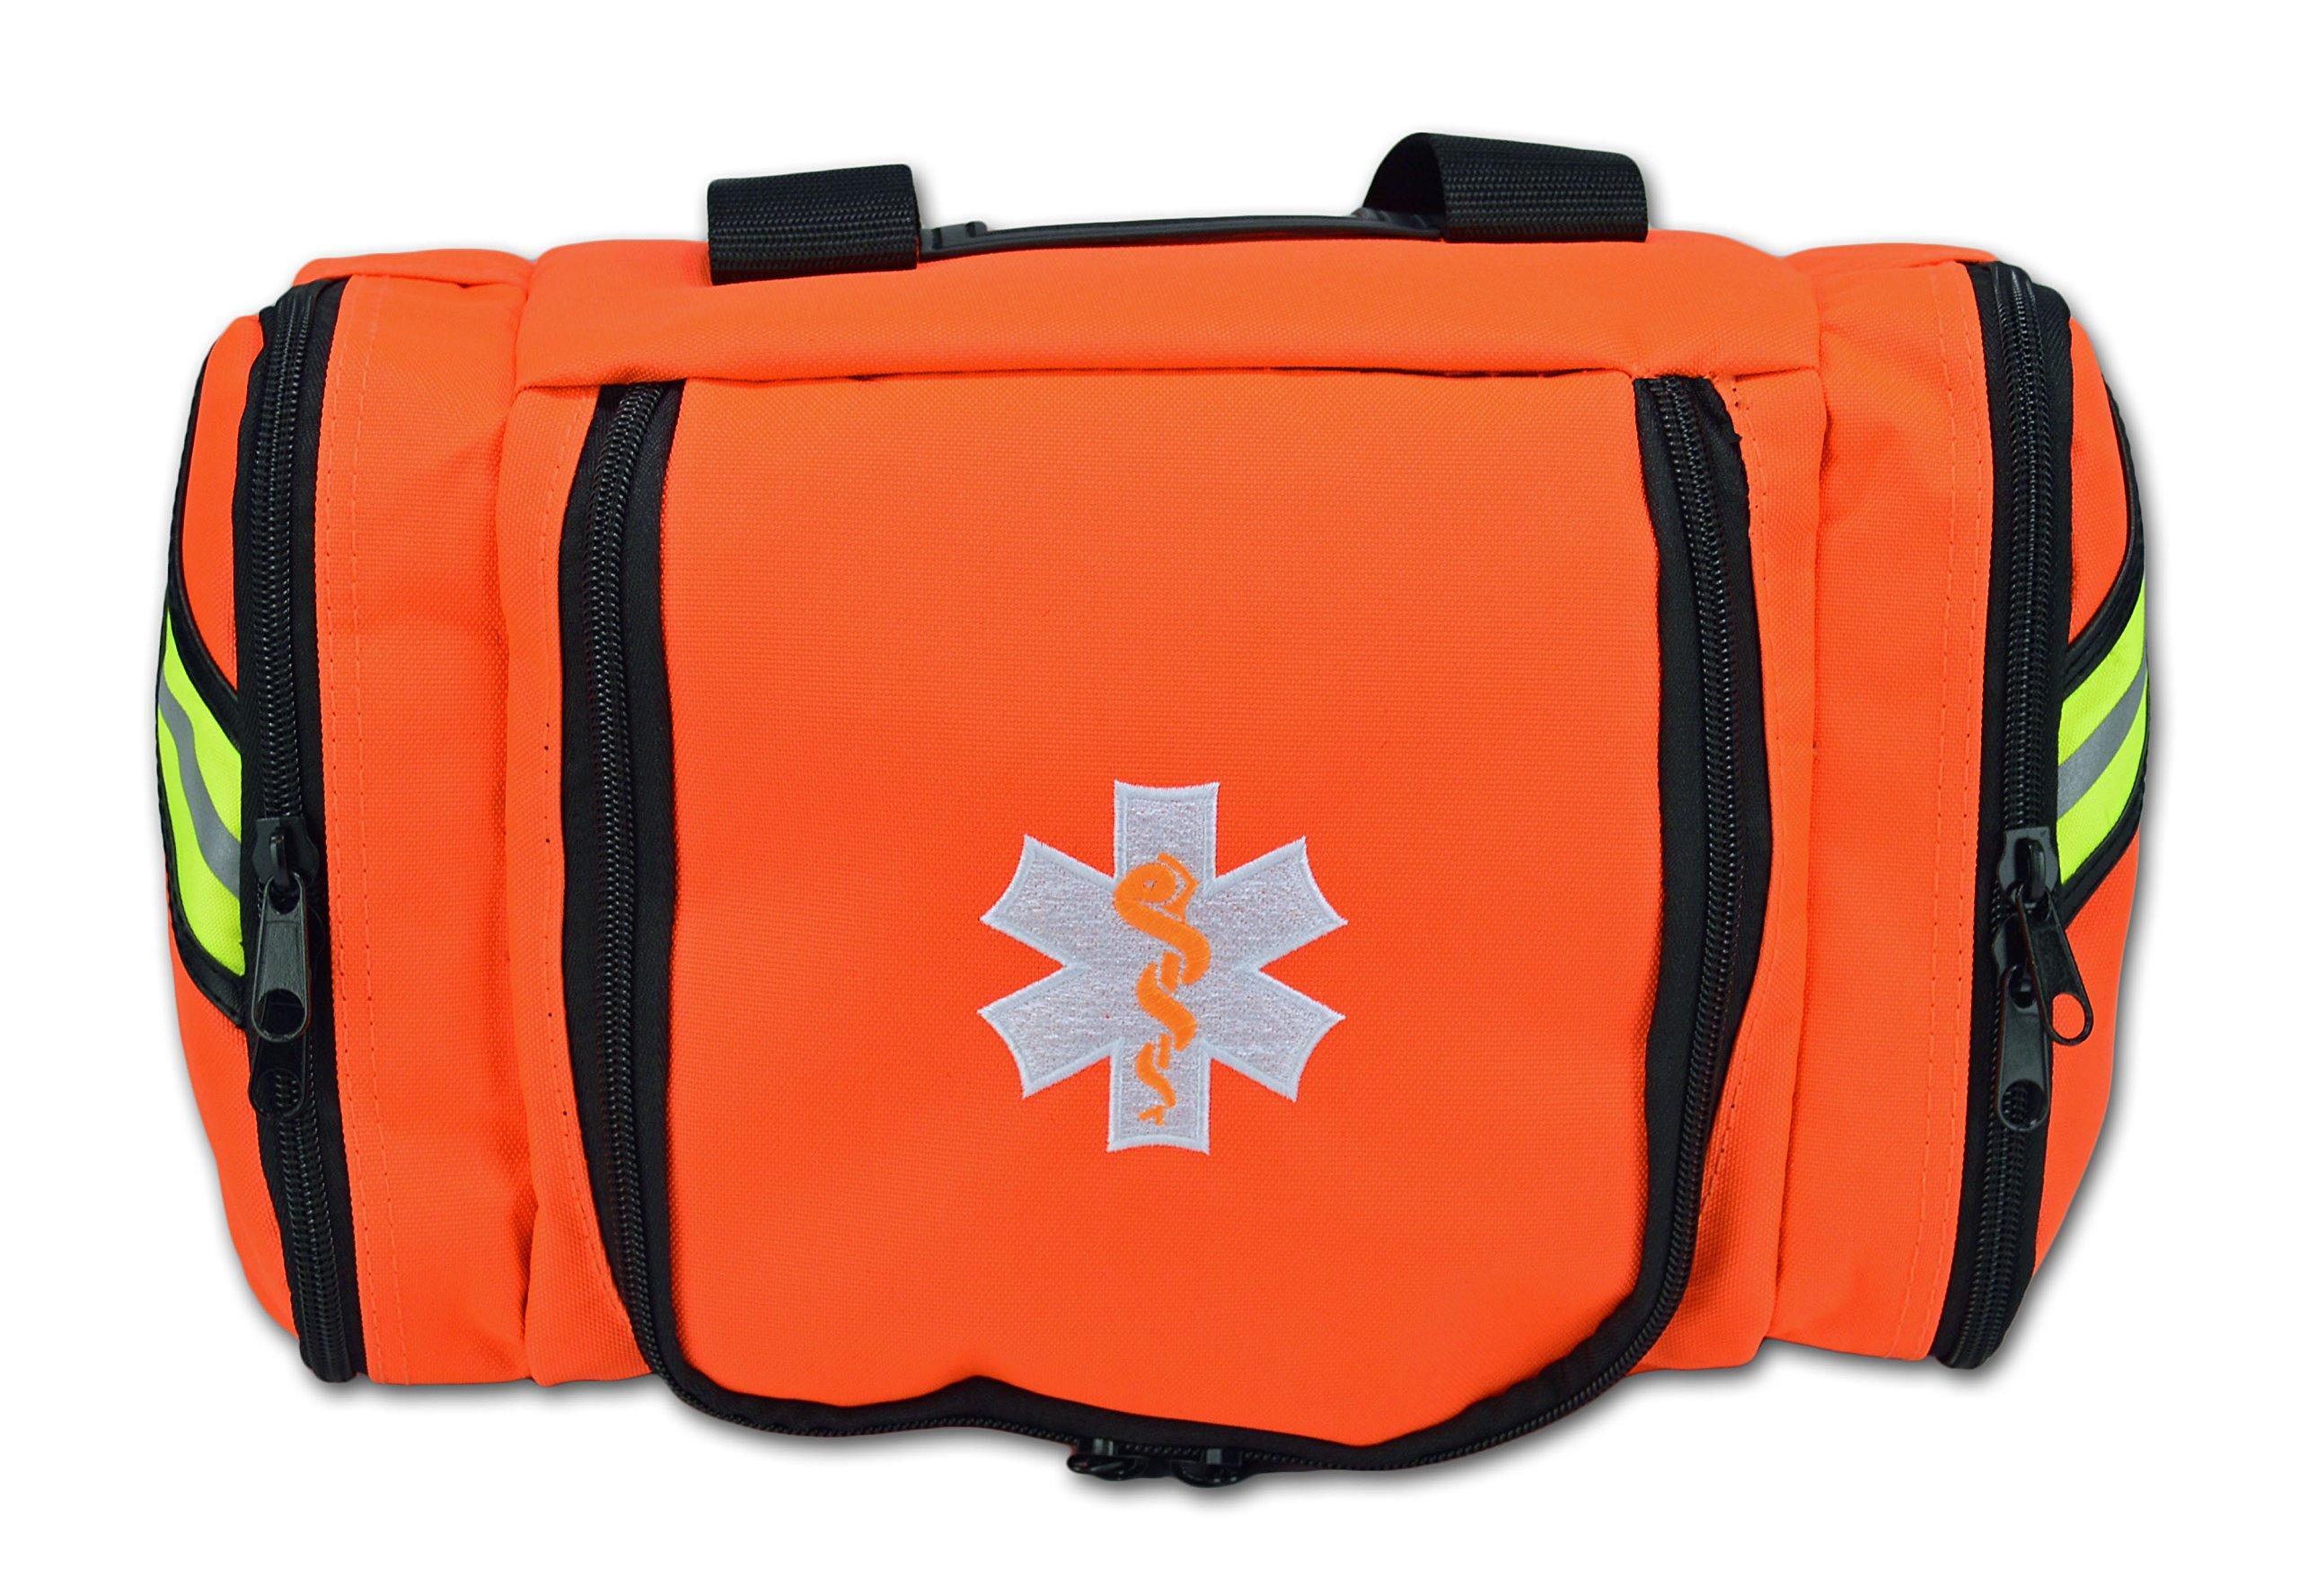 Lightning X Value Compact Medic First Responder EMS/EMT Stocked Trauma Bag w/Standard Fill Kit B - Orange by Lightning X Products (Image #3)